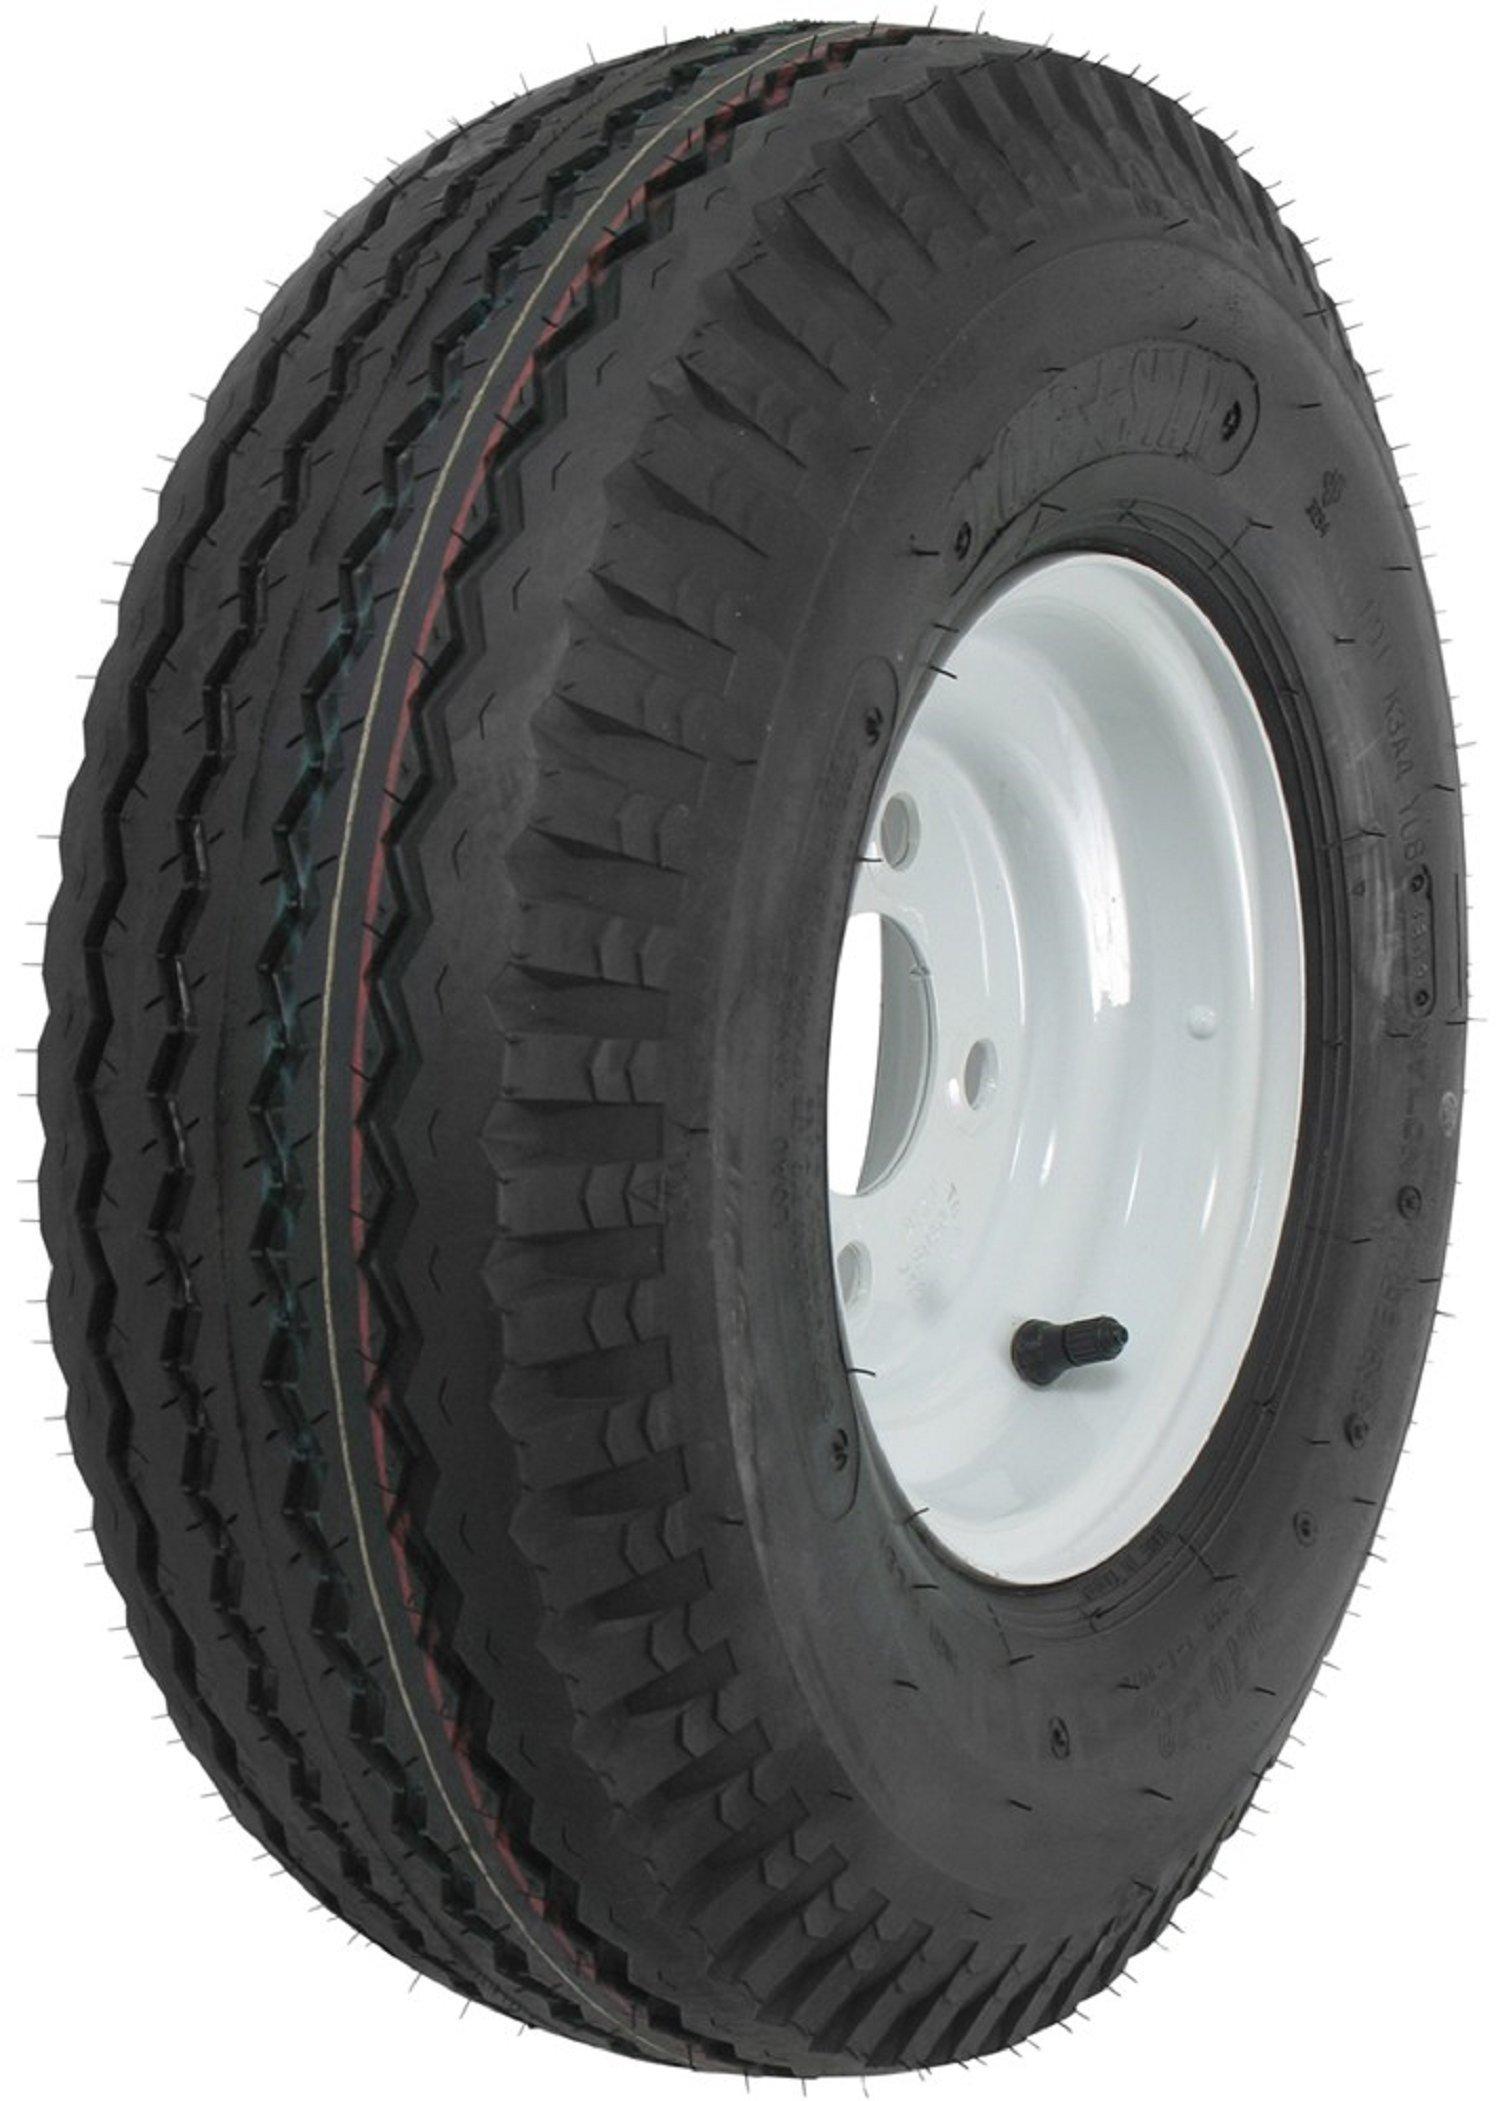 "eCustomRim Kenda K353 Trailer Tire & Rim 5.70-8 570-8 4H White Steel 6 Ply Load Range C 8"""